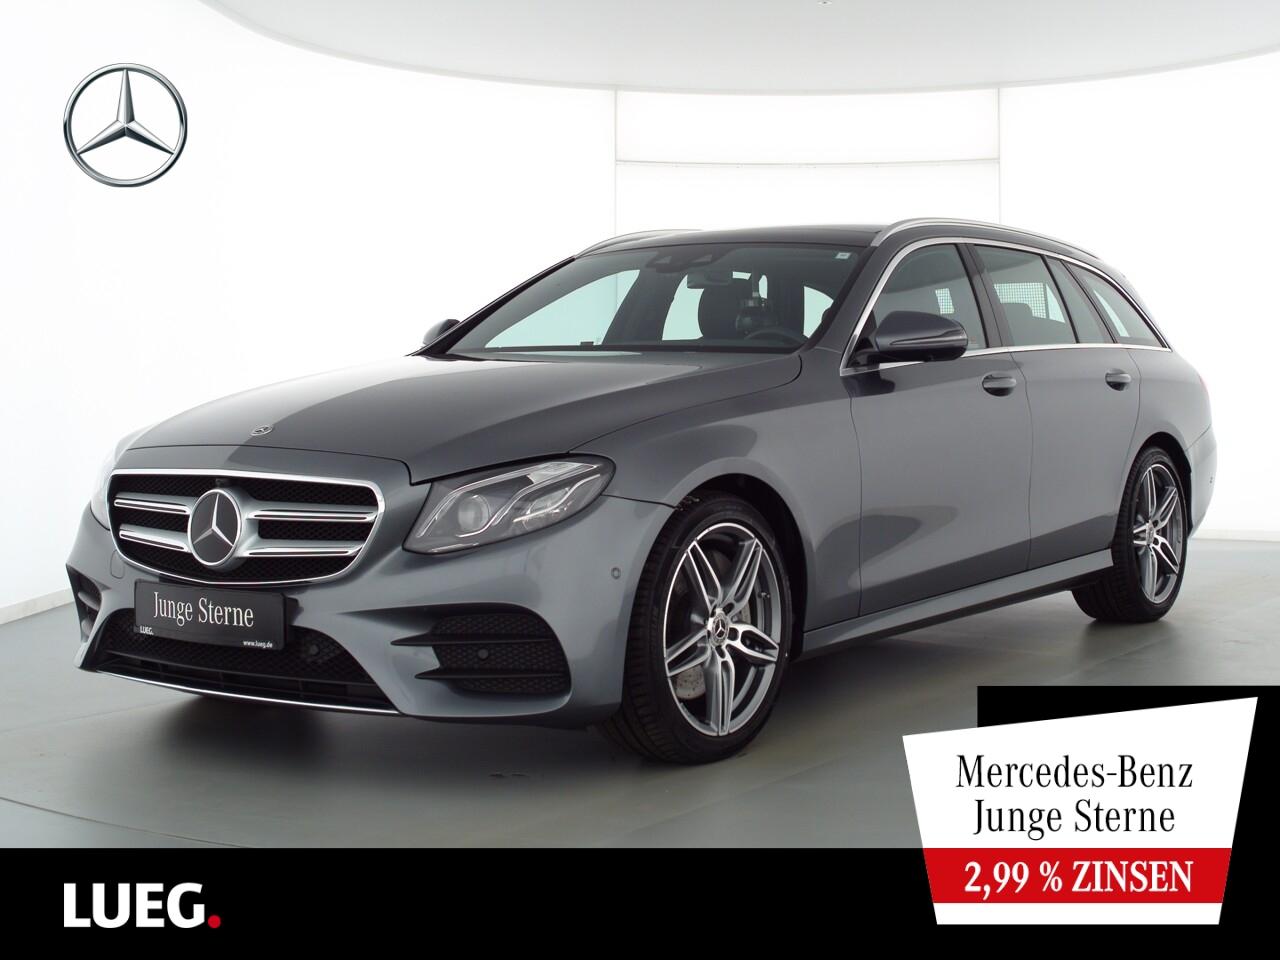 Mercedes-Benz E 450 T 4M AMG+COM+Pano+Mbeam+DistrPl+Widesc+360, Jahr 2020, Benzin